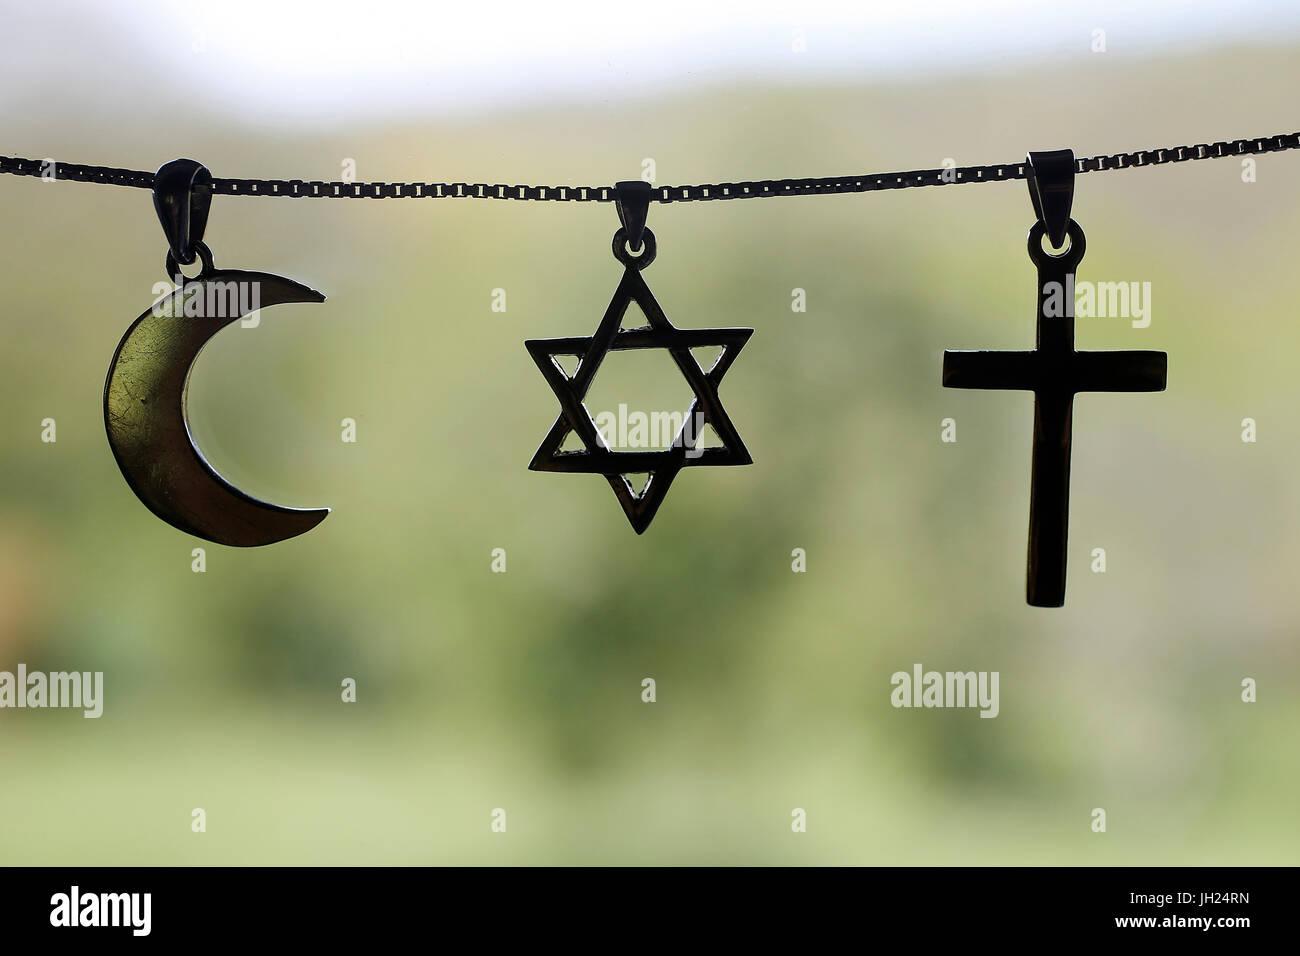 Symbols of islam, islam and christianity. - Stock Image